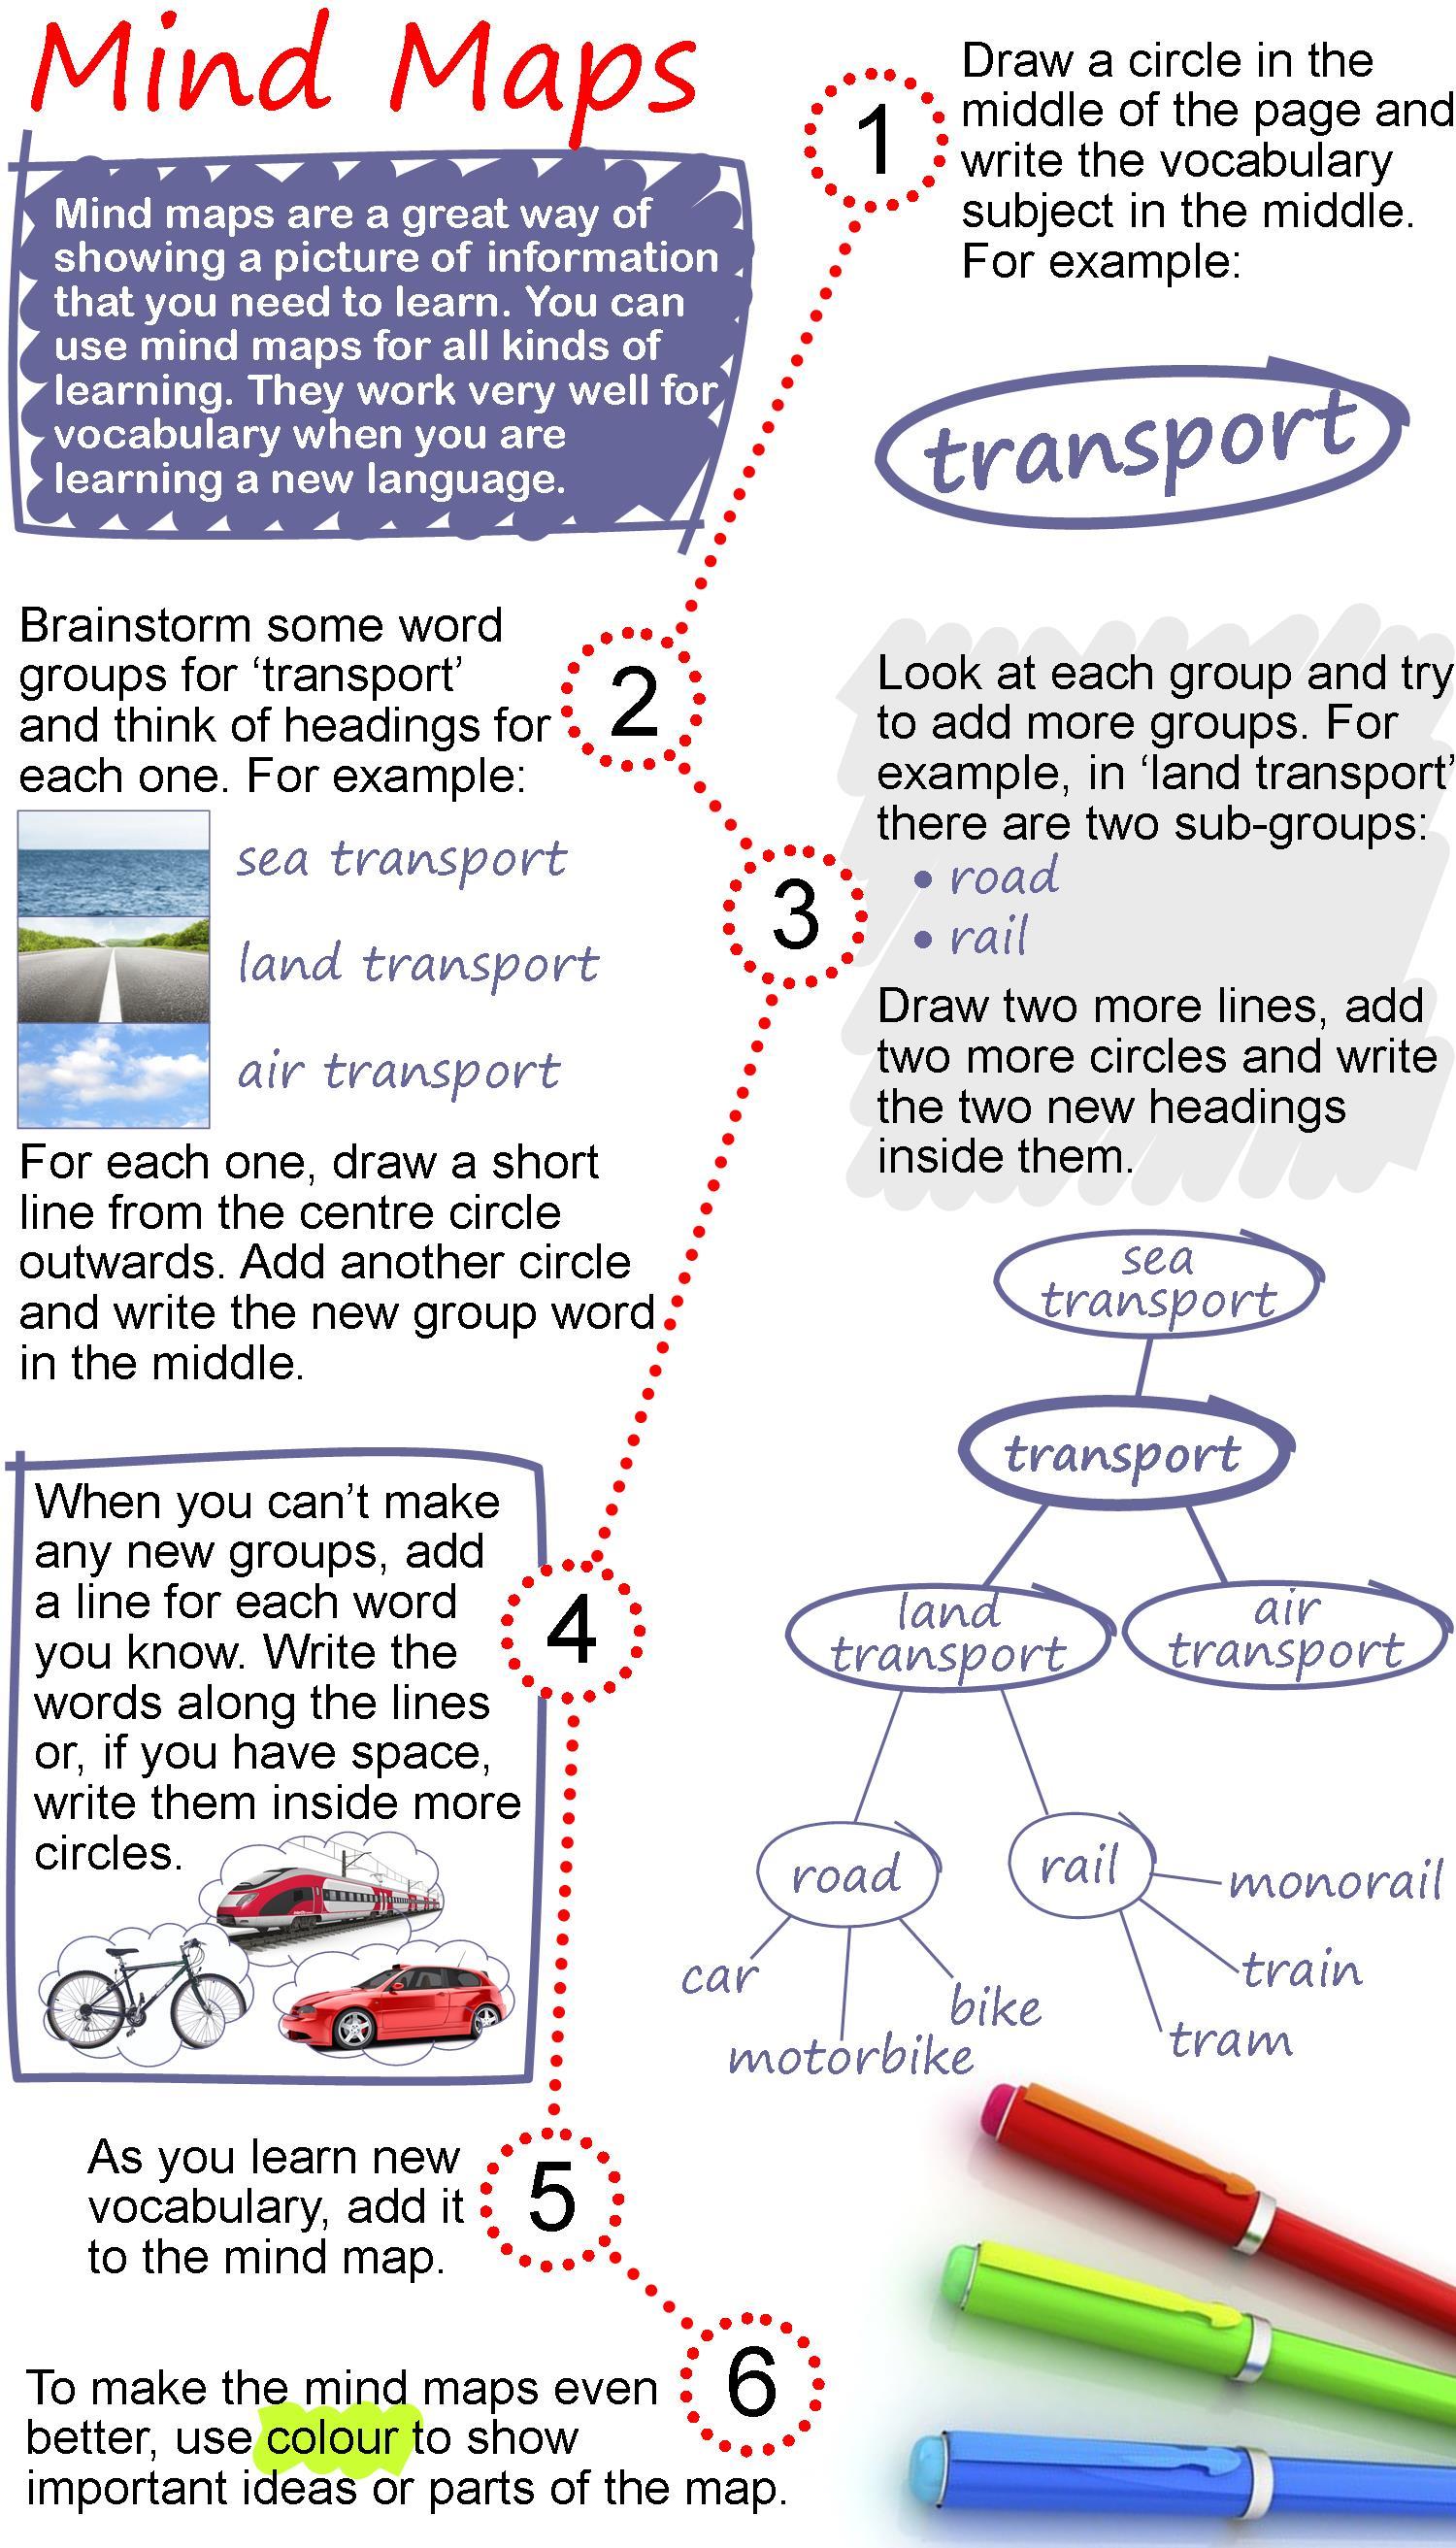 Mind Maps Learnenglish Teens